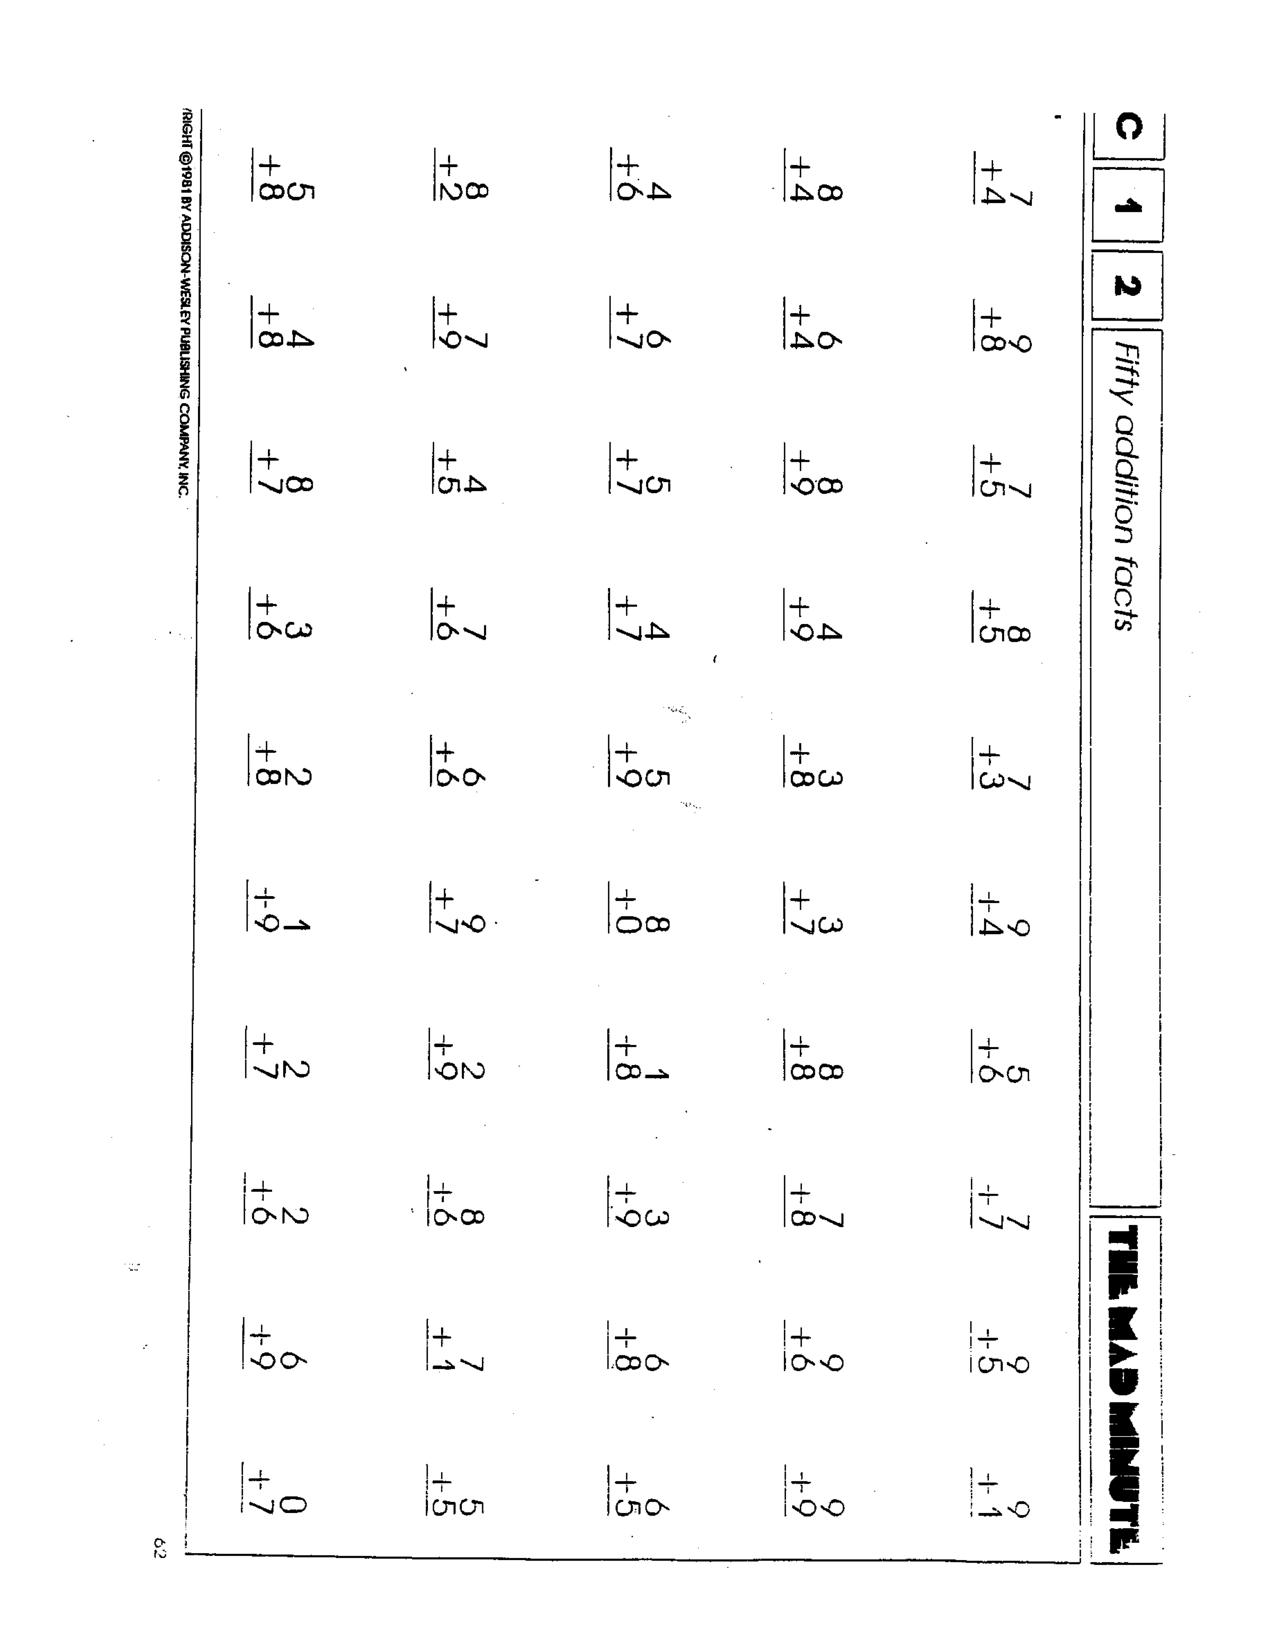 5th Grade Math Worksheets   Fifth Grade Math Worksheets   Math worksheets [ 1650 x 1275 Pixel ]